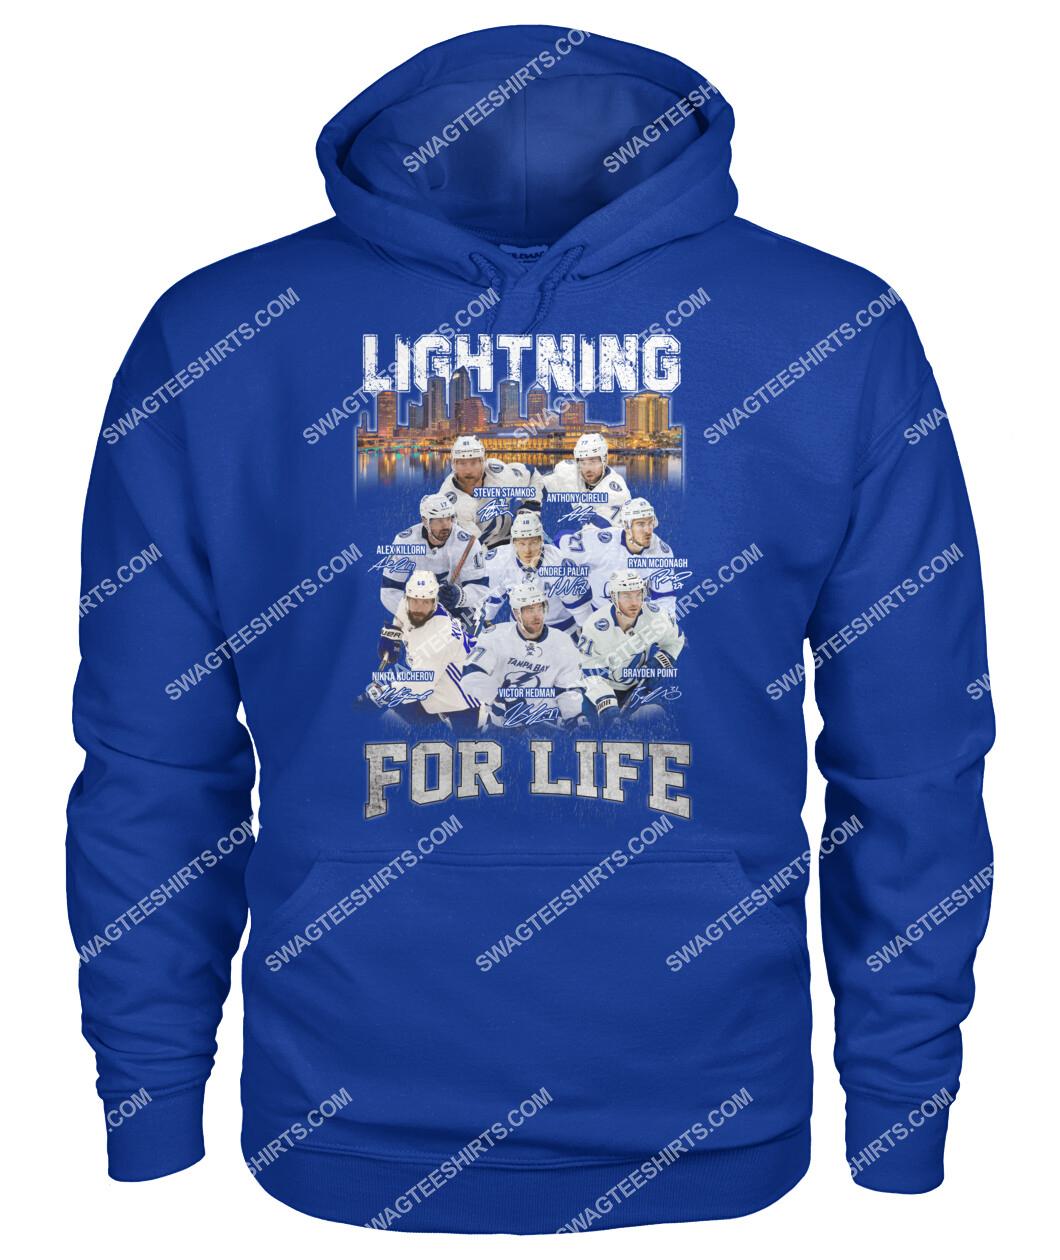 lightning for life tampa bay lightning national hockey league hoodie 1